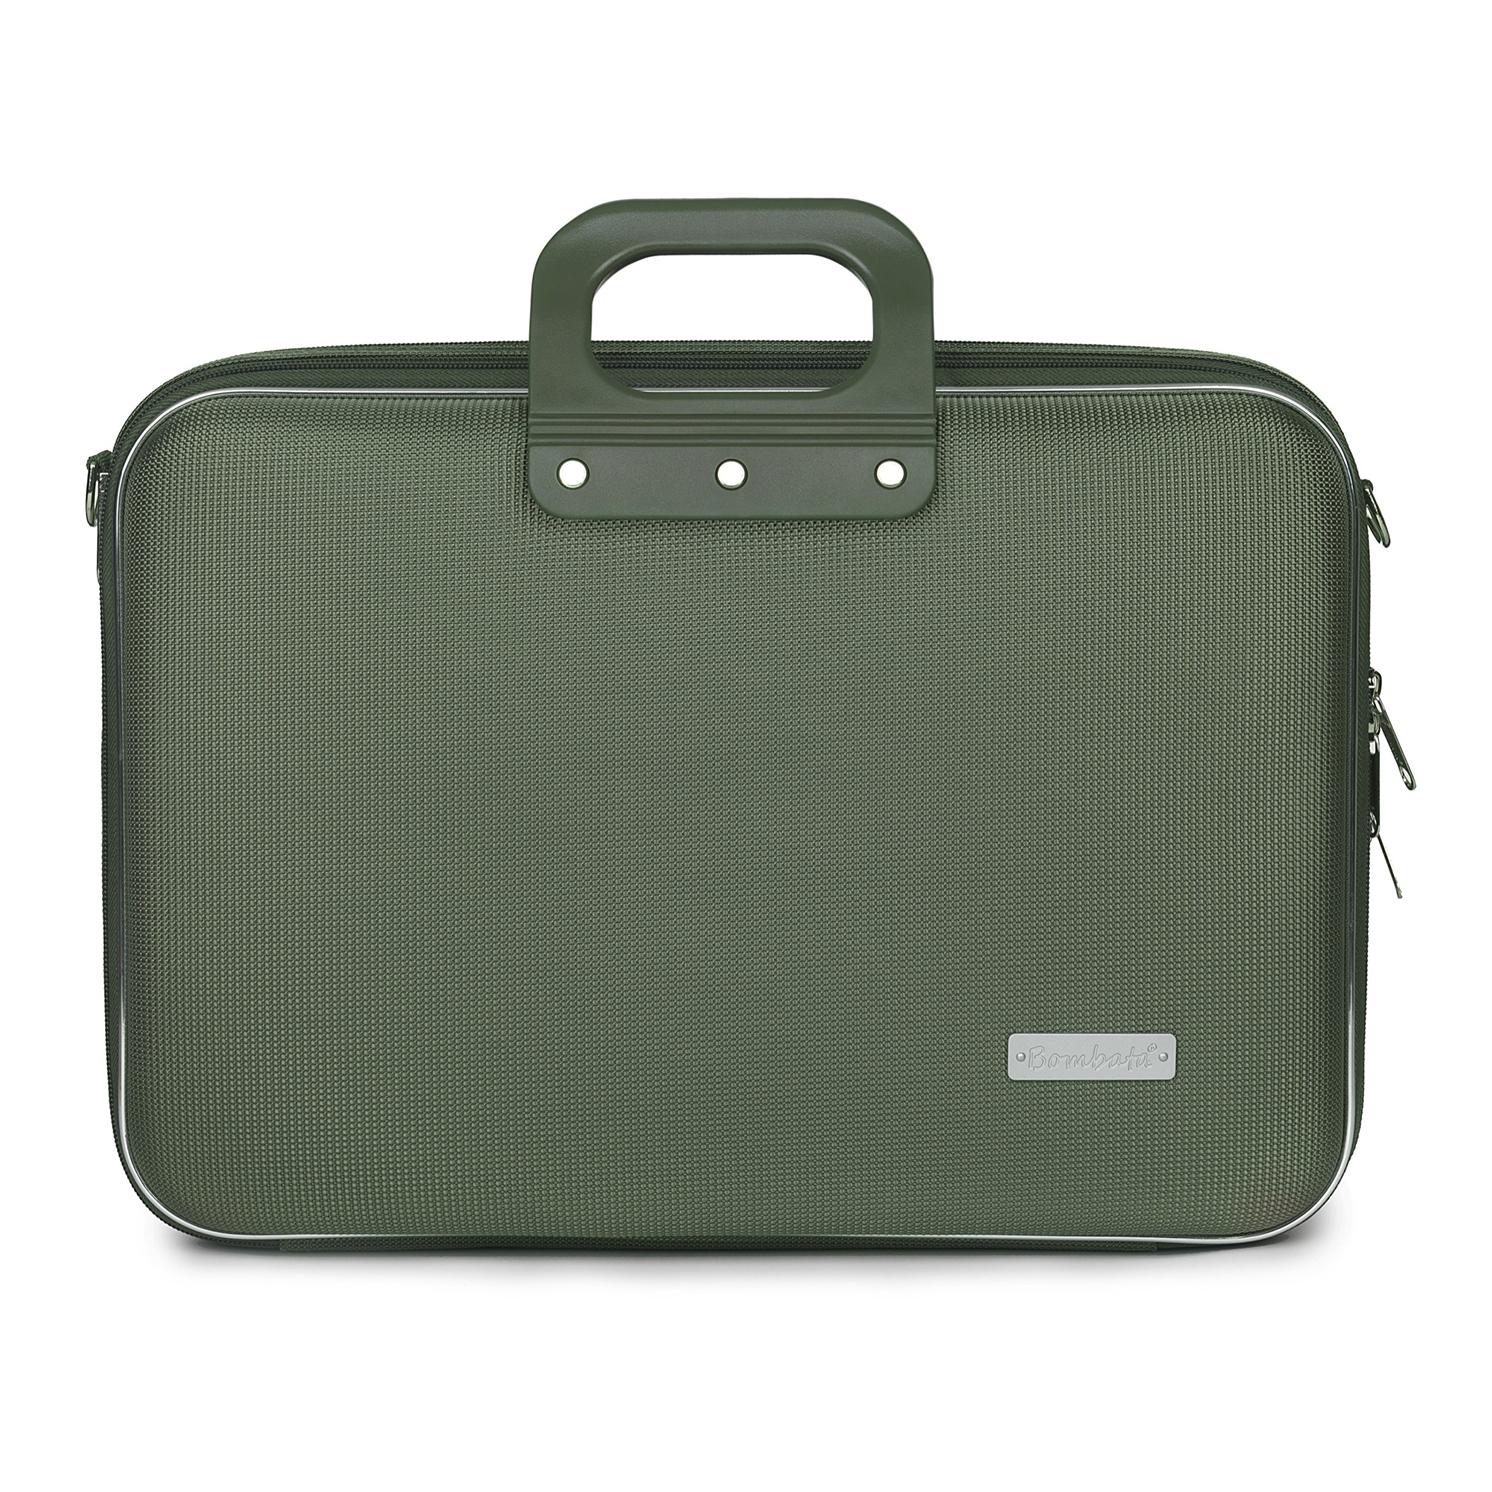 Bombata – Khaki Business Nylon 15.6″ Laptop Brief Case/Bag with Shoulder Strap